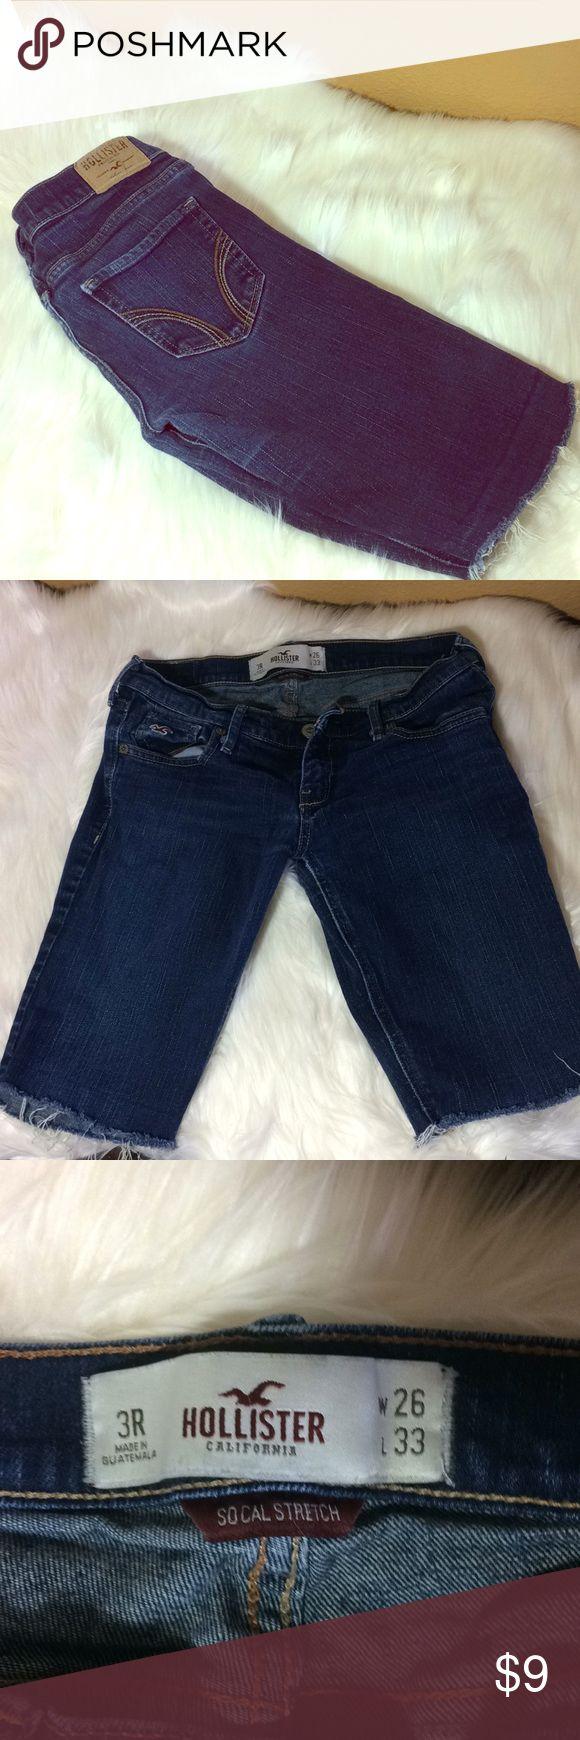 hollister jeans short length